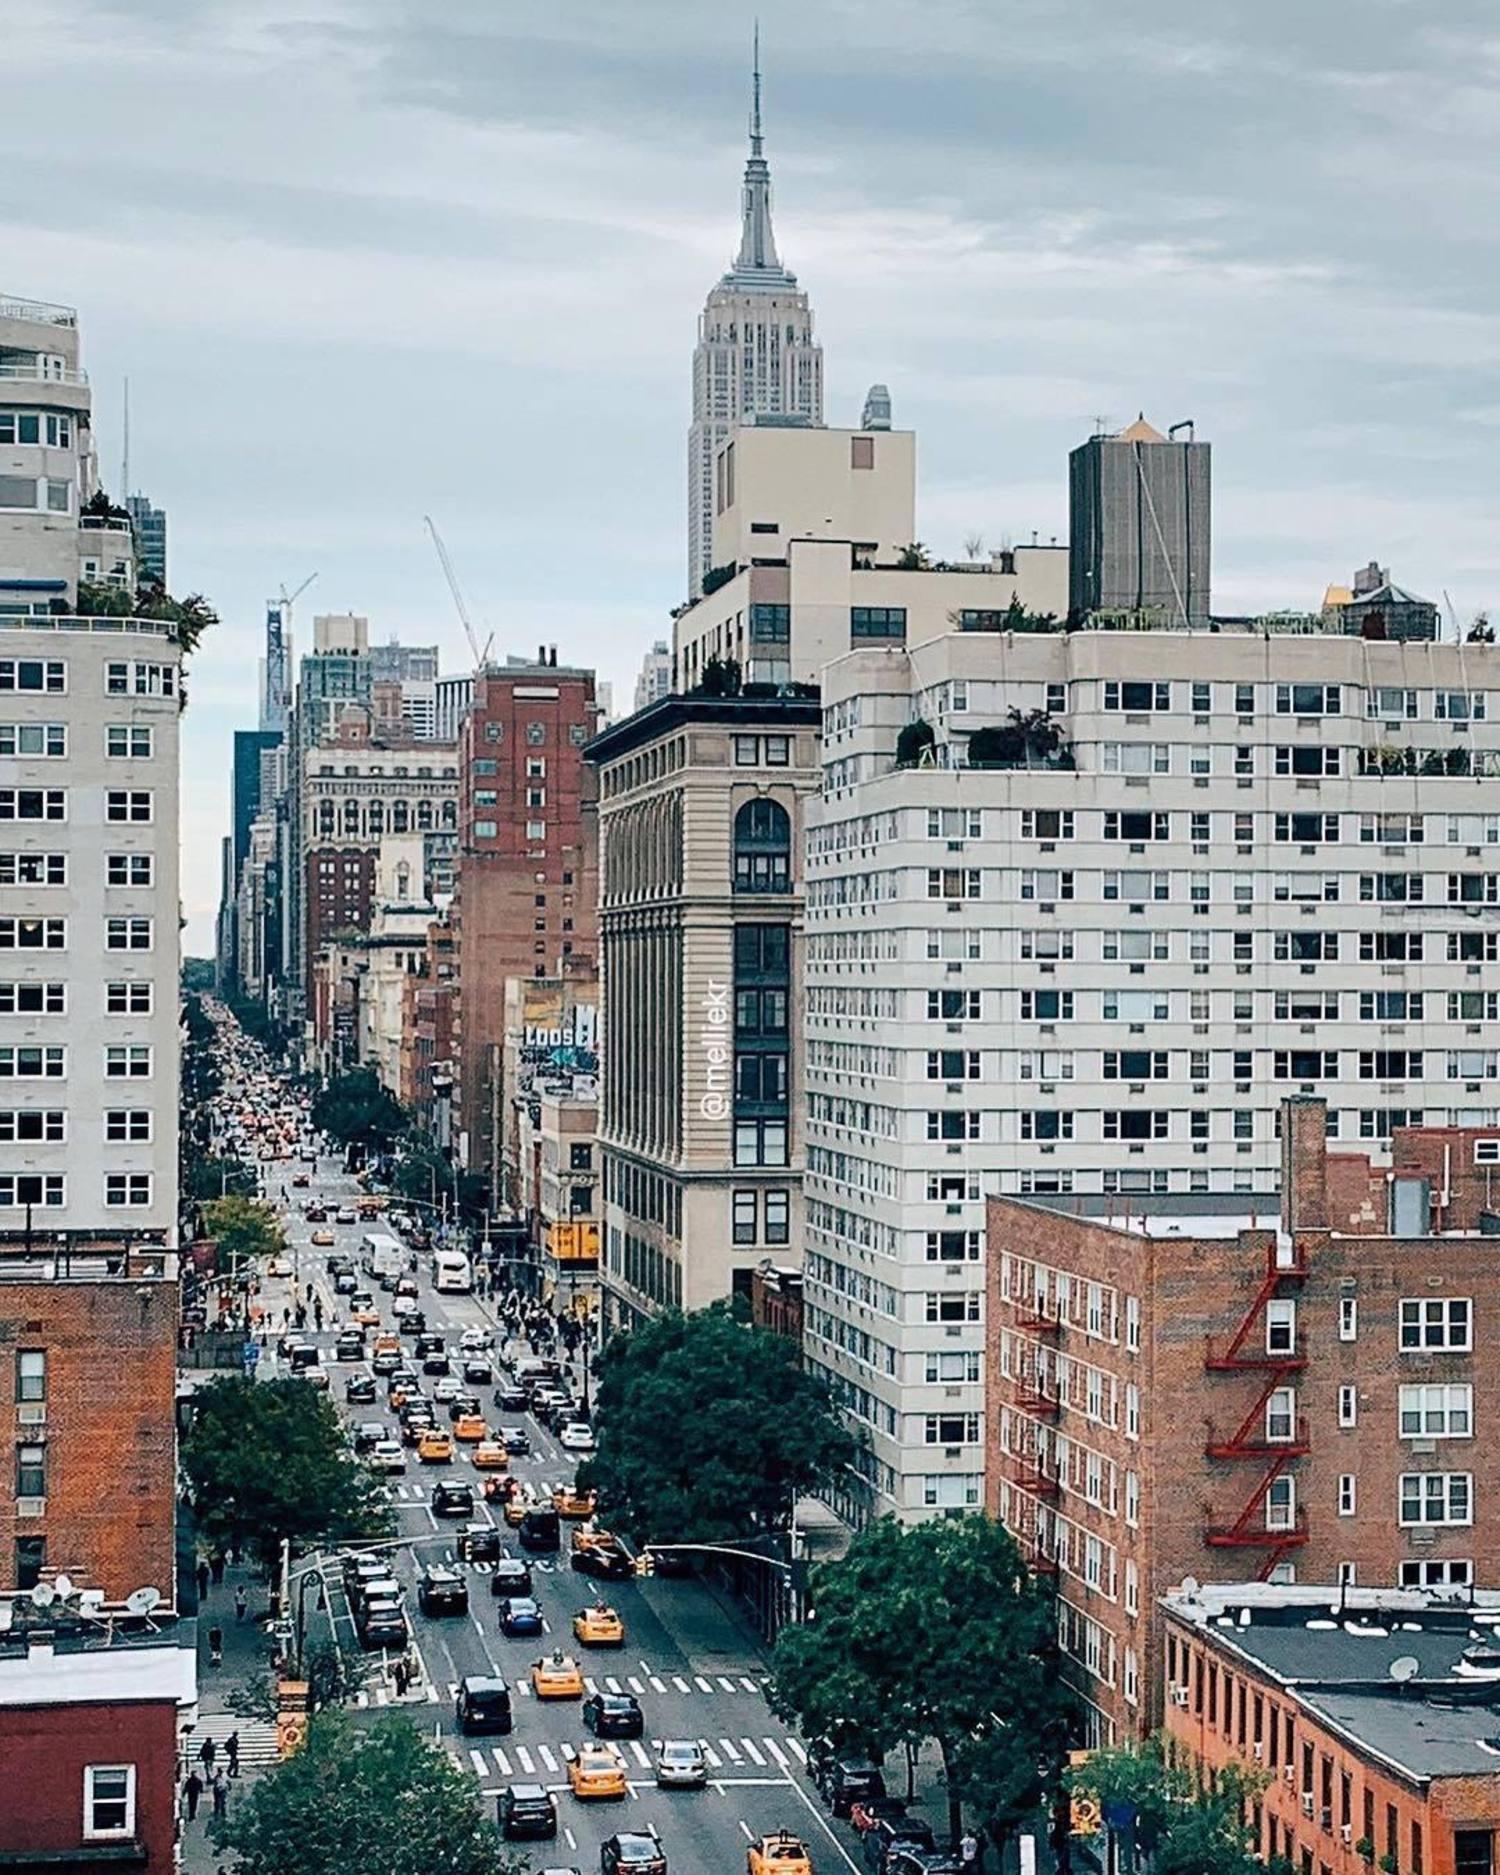 6th Avenue, Manhattan. Photo via @melliekr #newyork #newyorkcity #nyc #viewingnyc #6thavenue #6thave